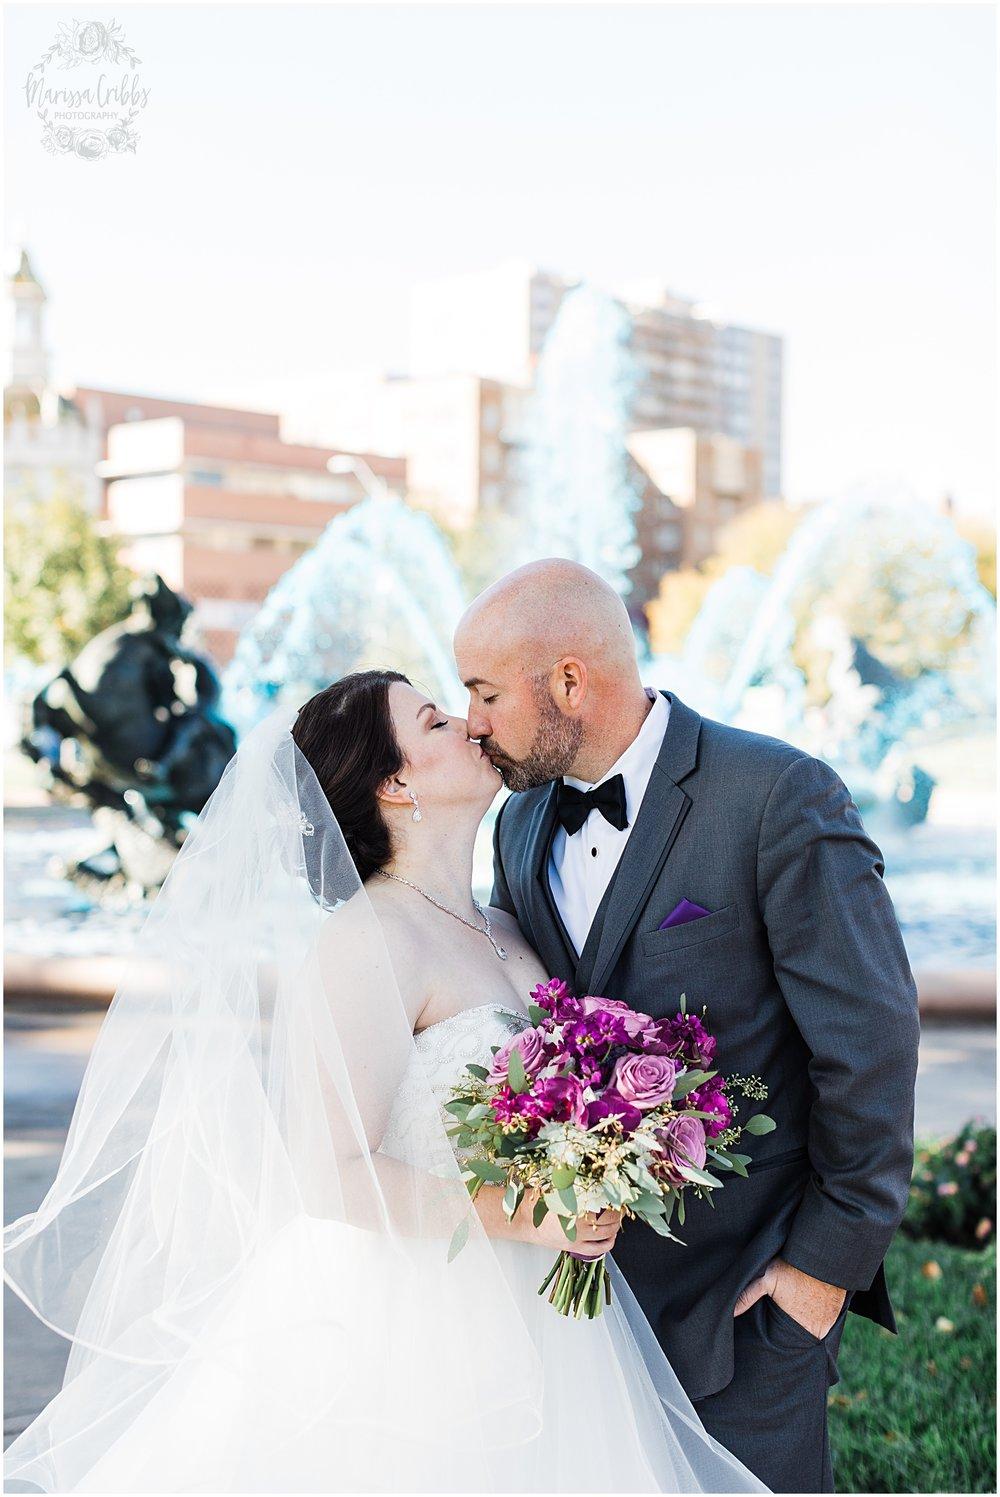 LAURA & DAN MARRIED | NELSON ATKINS MUSEUM | MARISSA CRIBBS PHOTOGRAPHY_7012.jpg